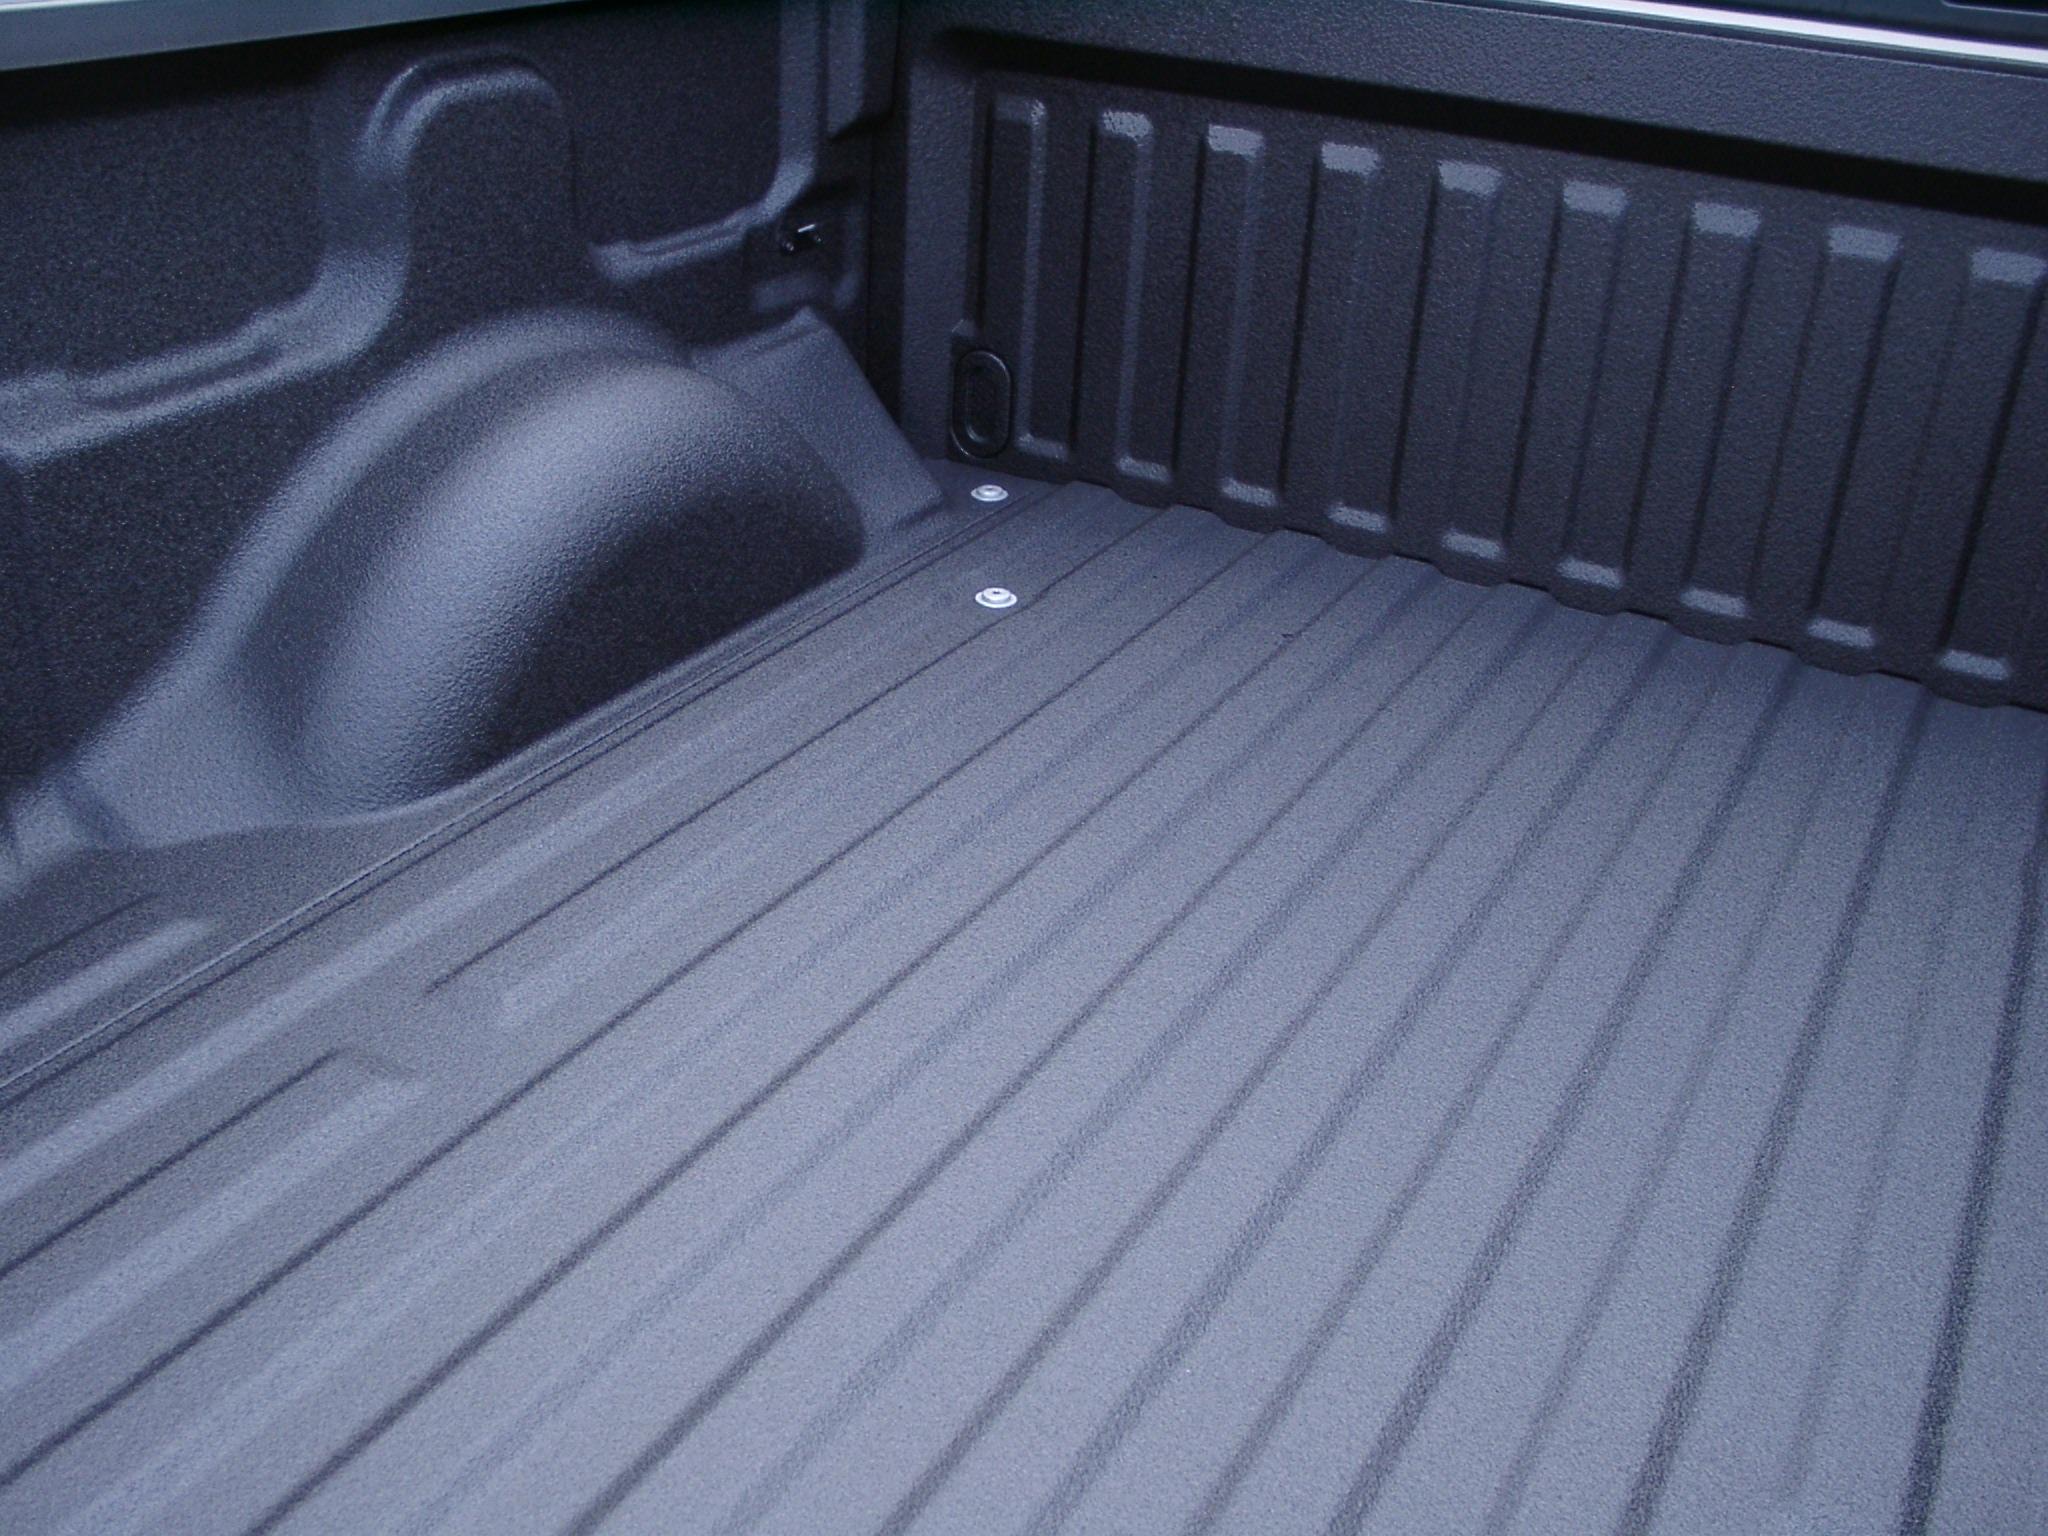 Ford Indy Bedliners Bed Liner